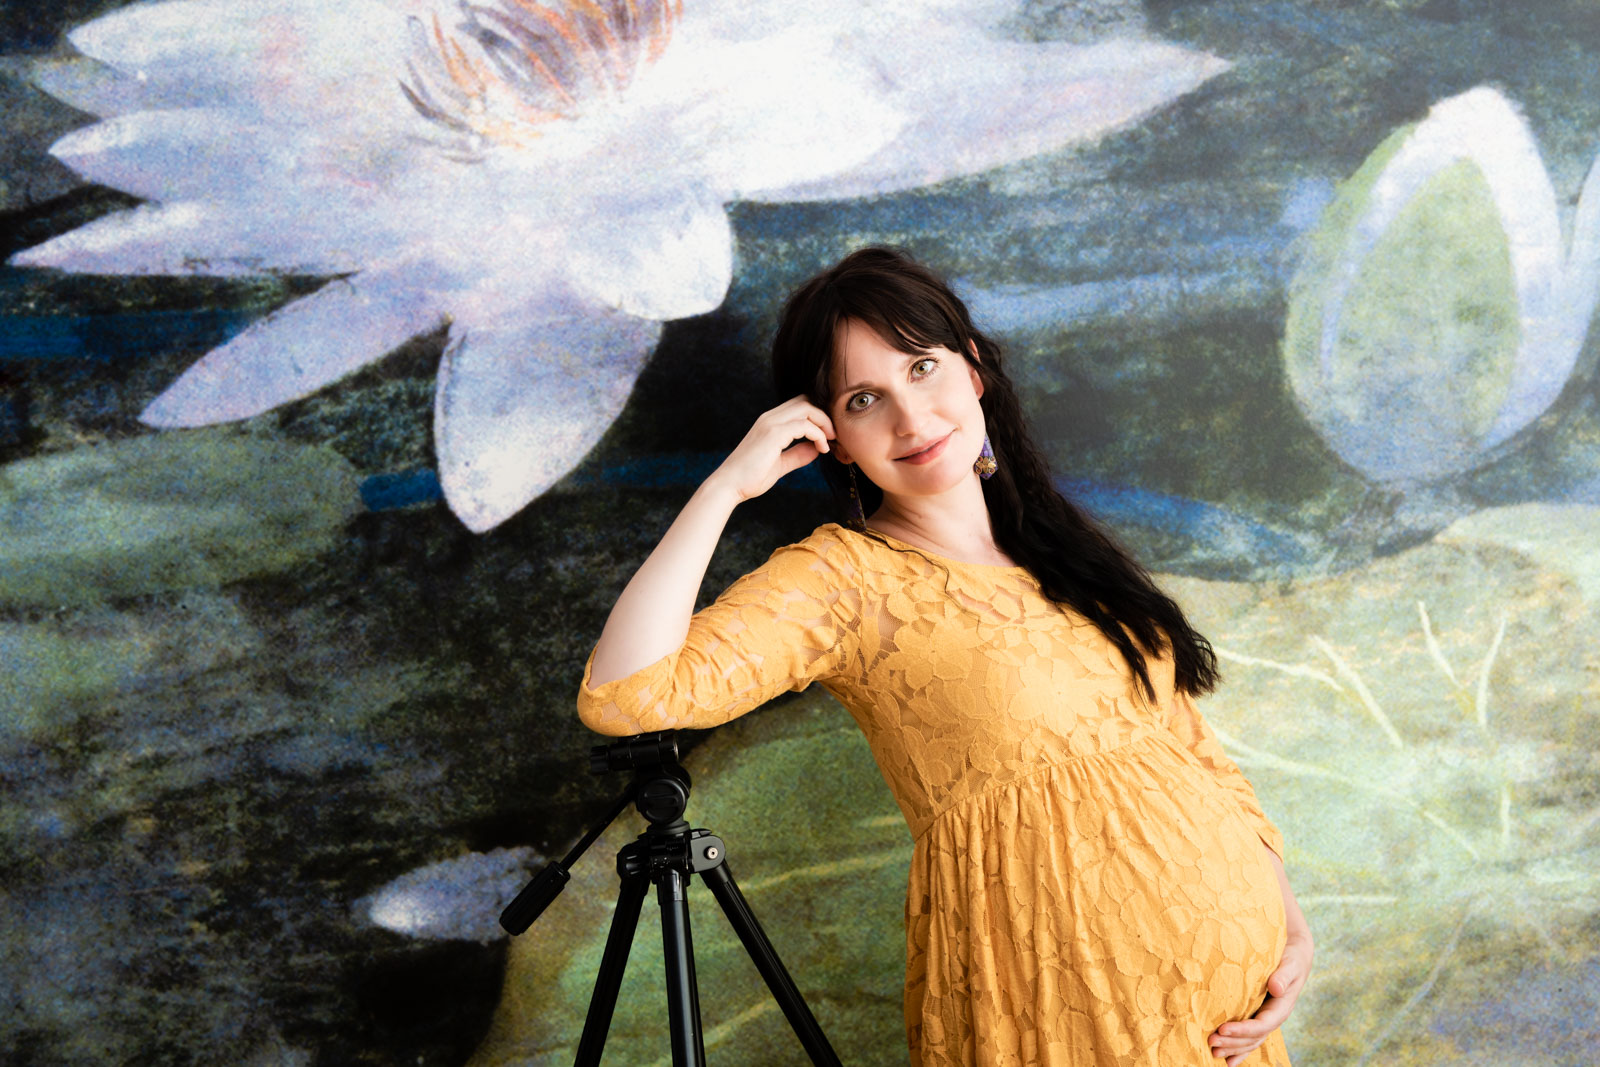 Zwangerschapsfotograaf Zwangerschapsfoto Noord-Holland Haarlem Heemstede Zalmiy Paeez Fotografie